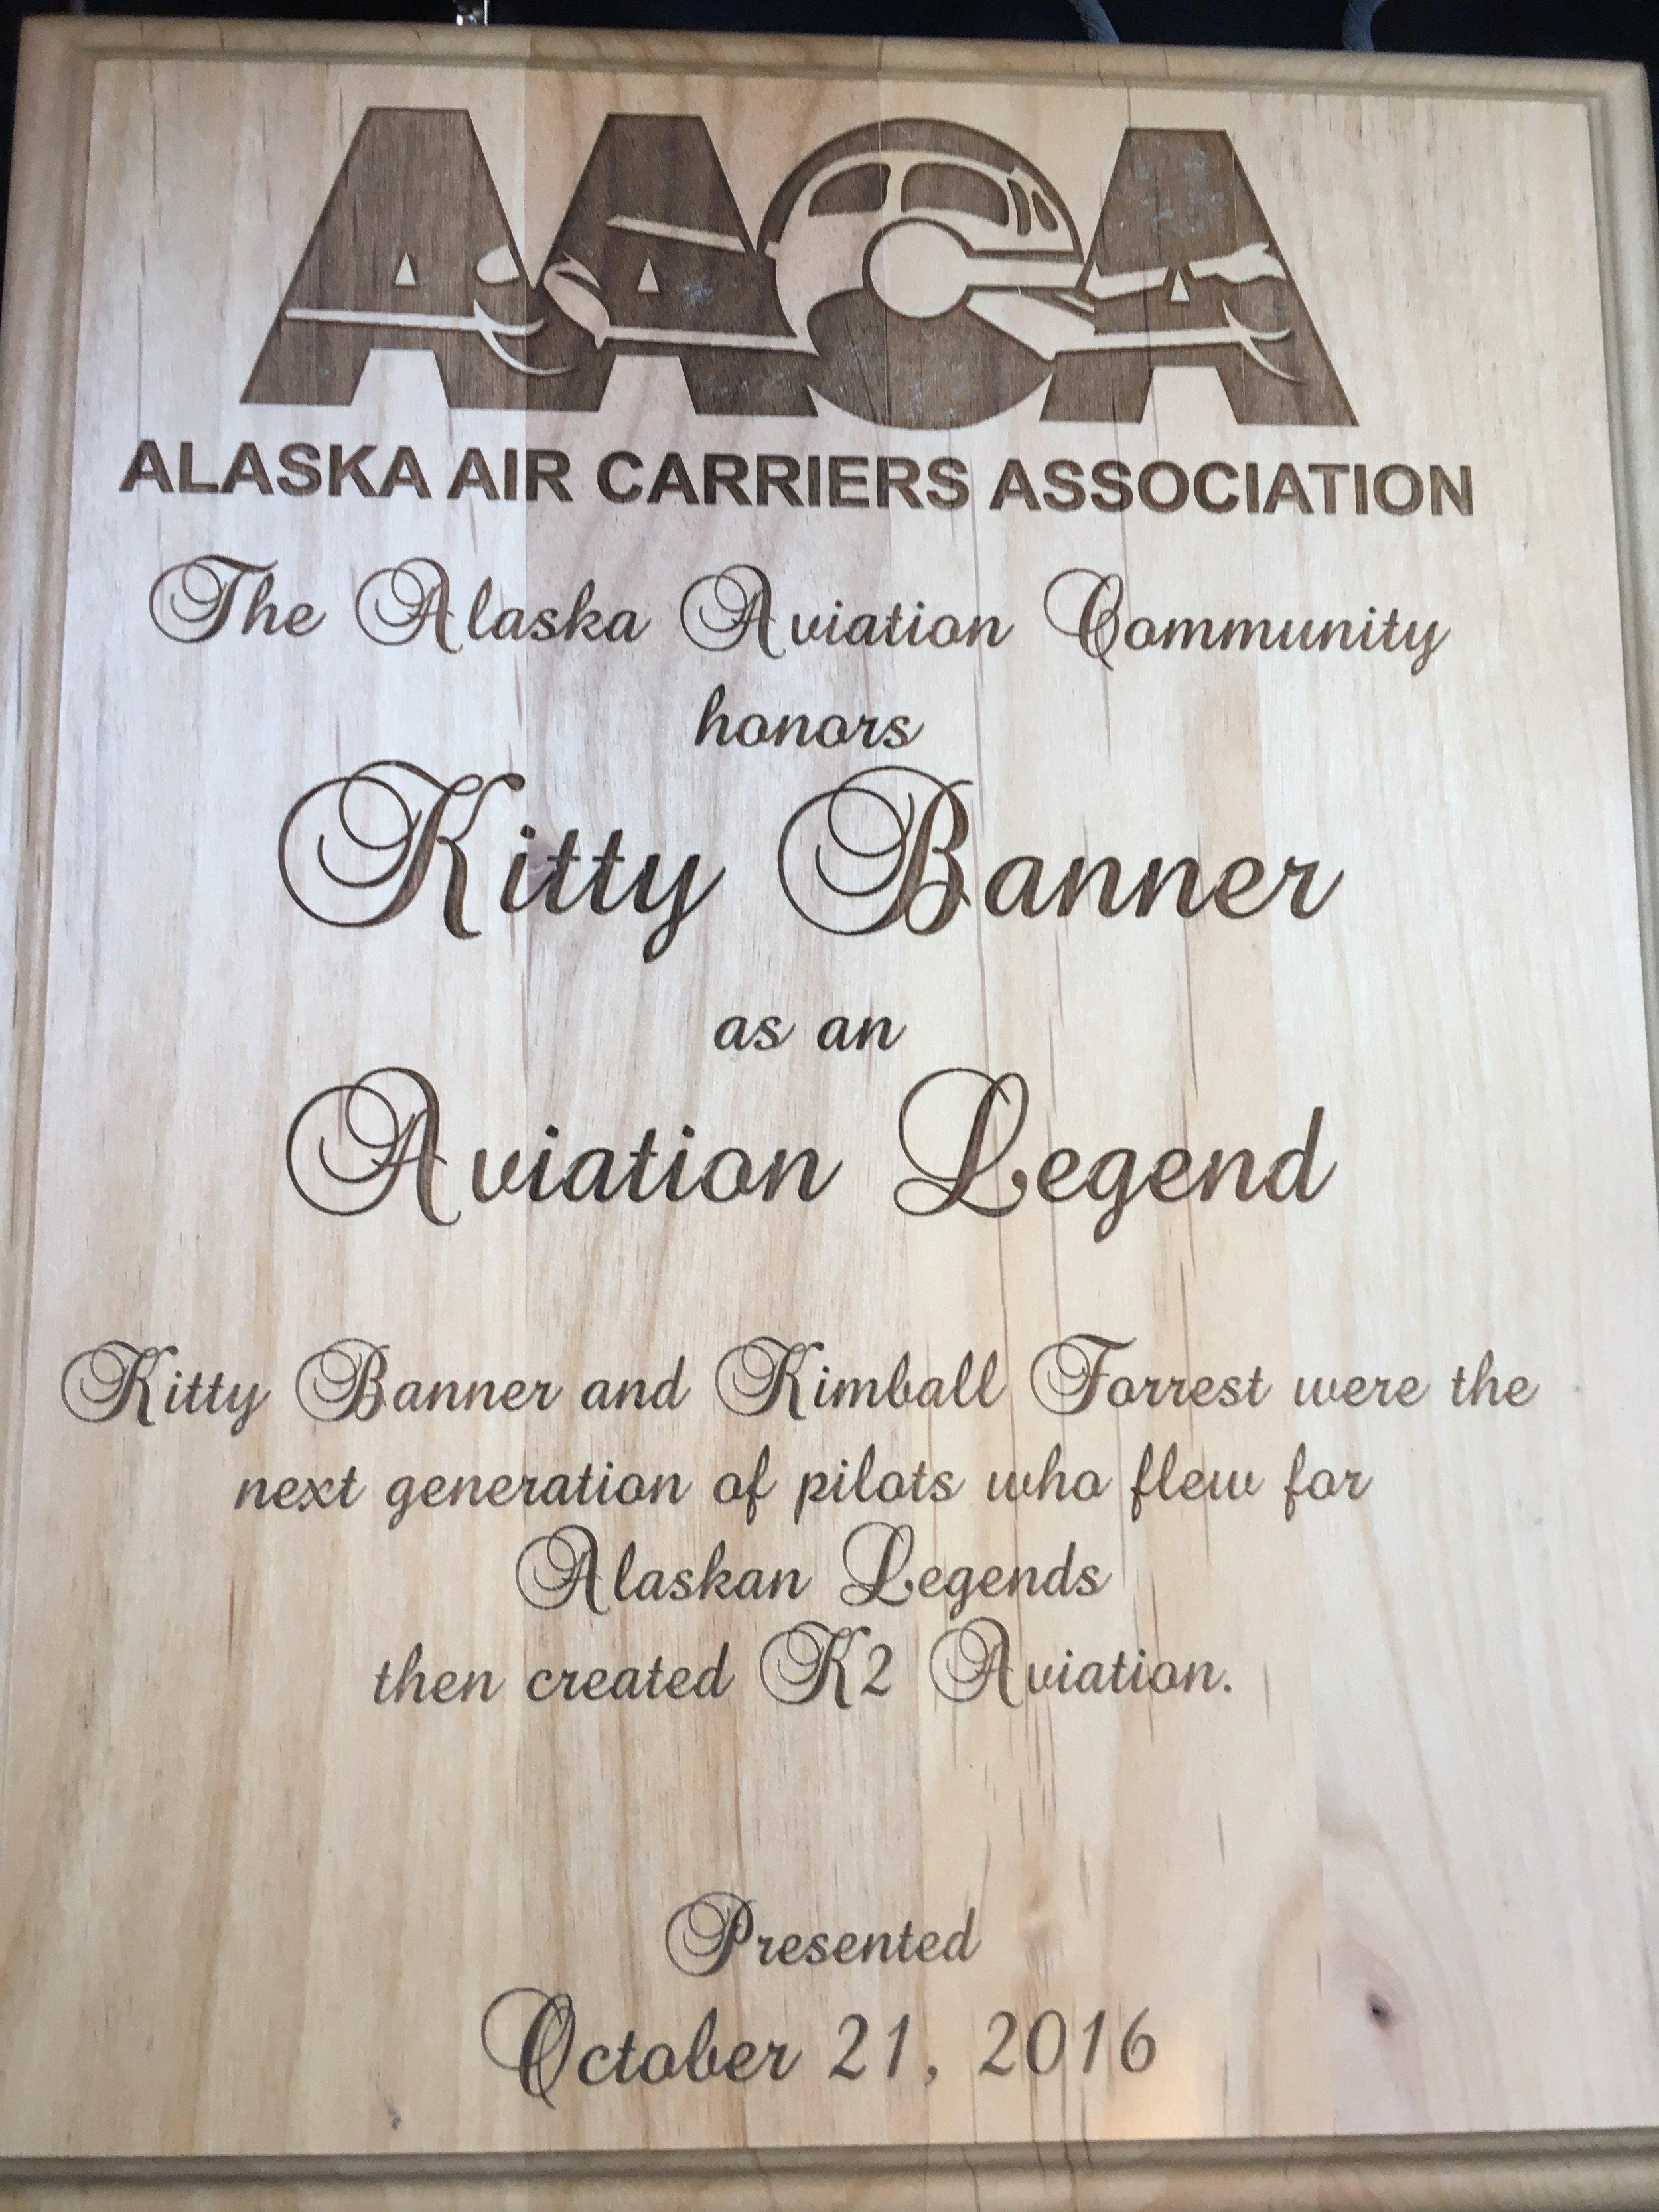 236 Alaska Air Carriers Assn Aviation Legend Award Anchorage.Nov 2016JPG.JPG